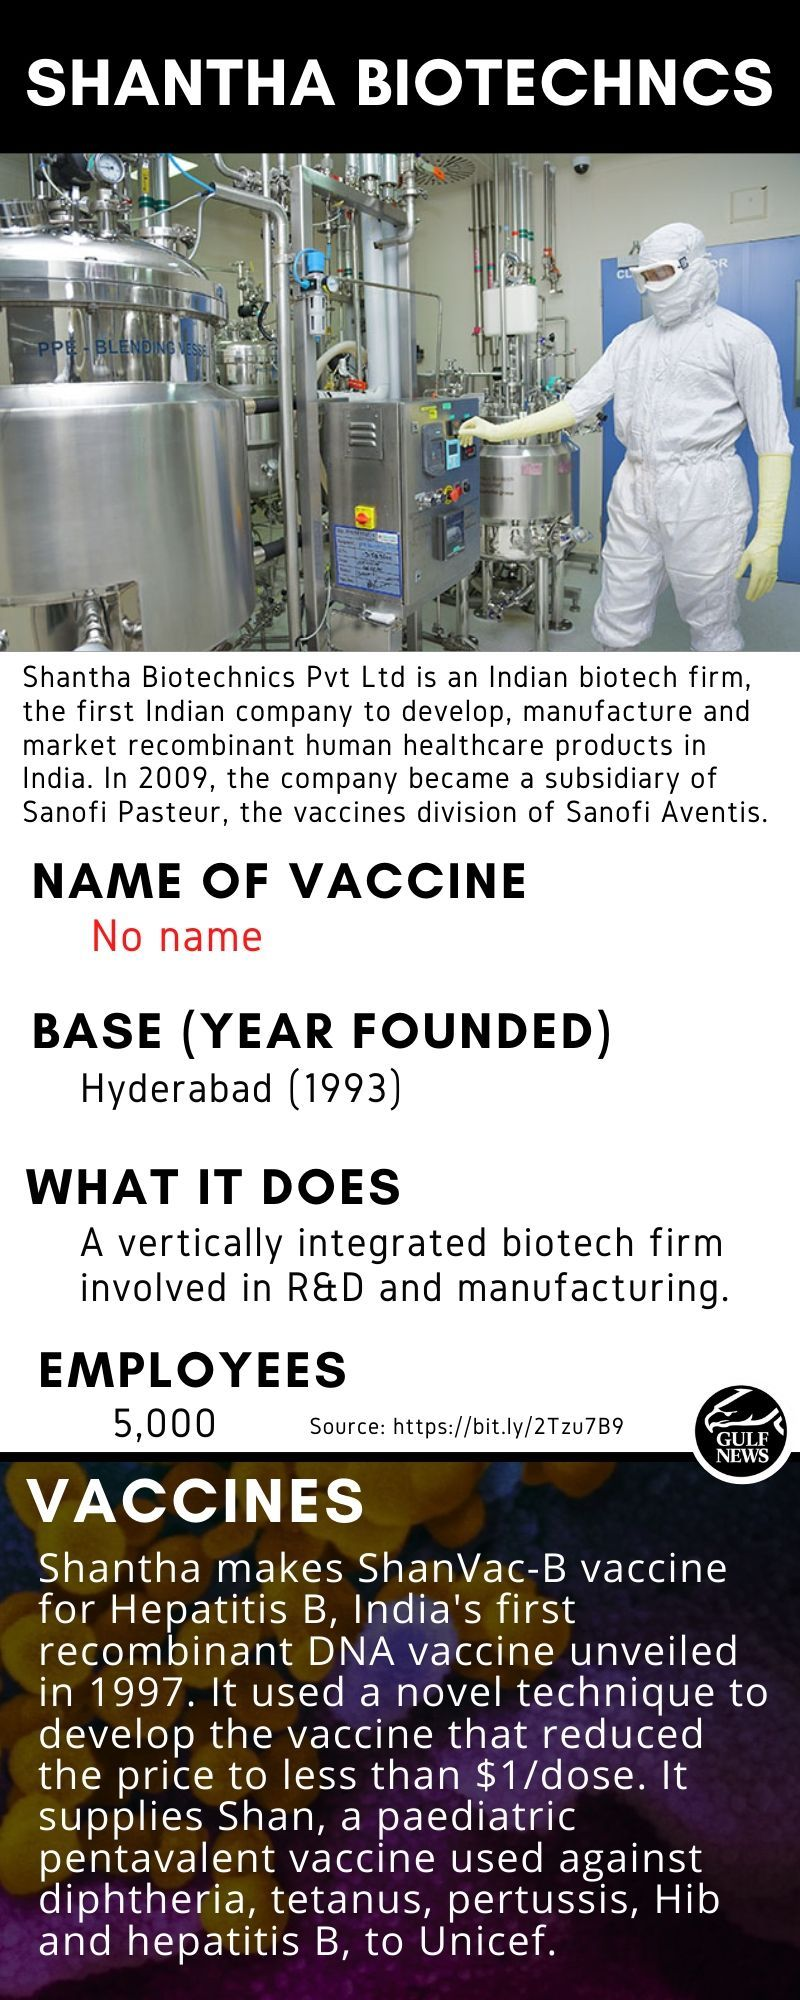 https://imagevars.gulfnews.com/2020/05/25/Shantha-Biotechnics_1724c641aee_original-ratio.jpg